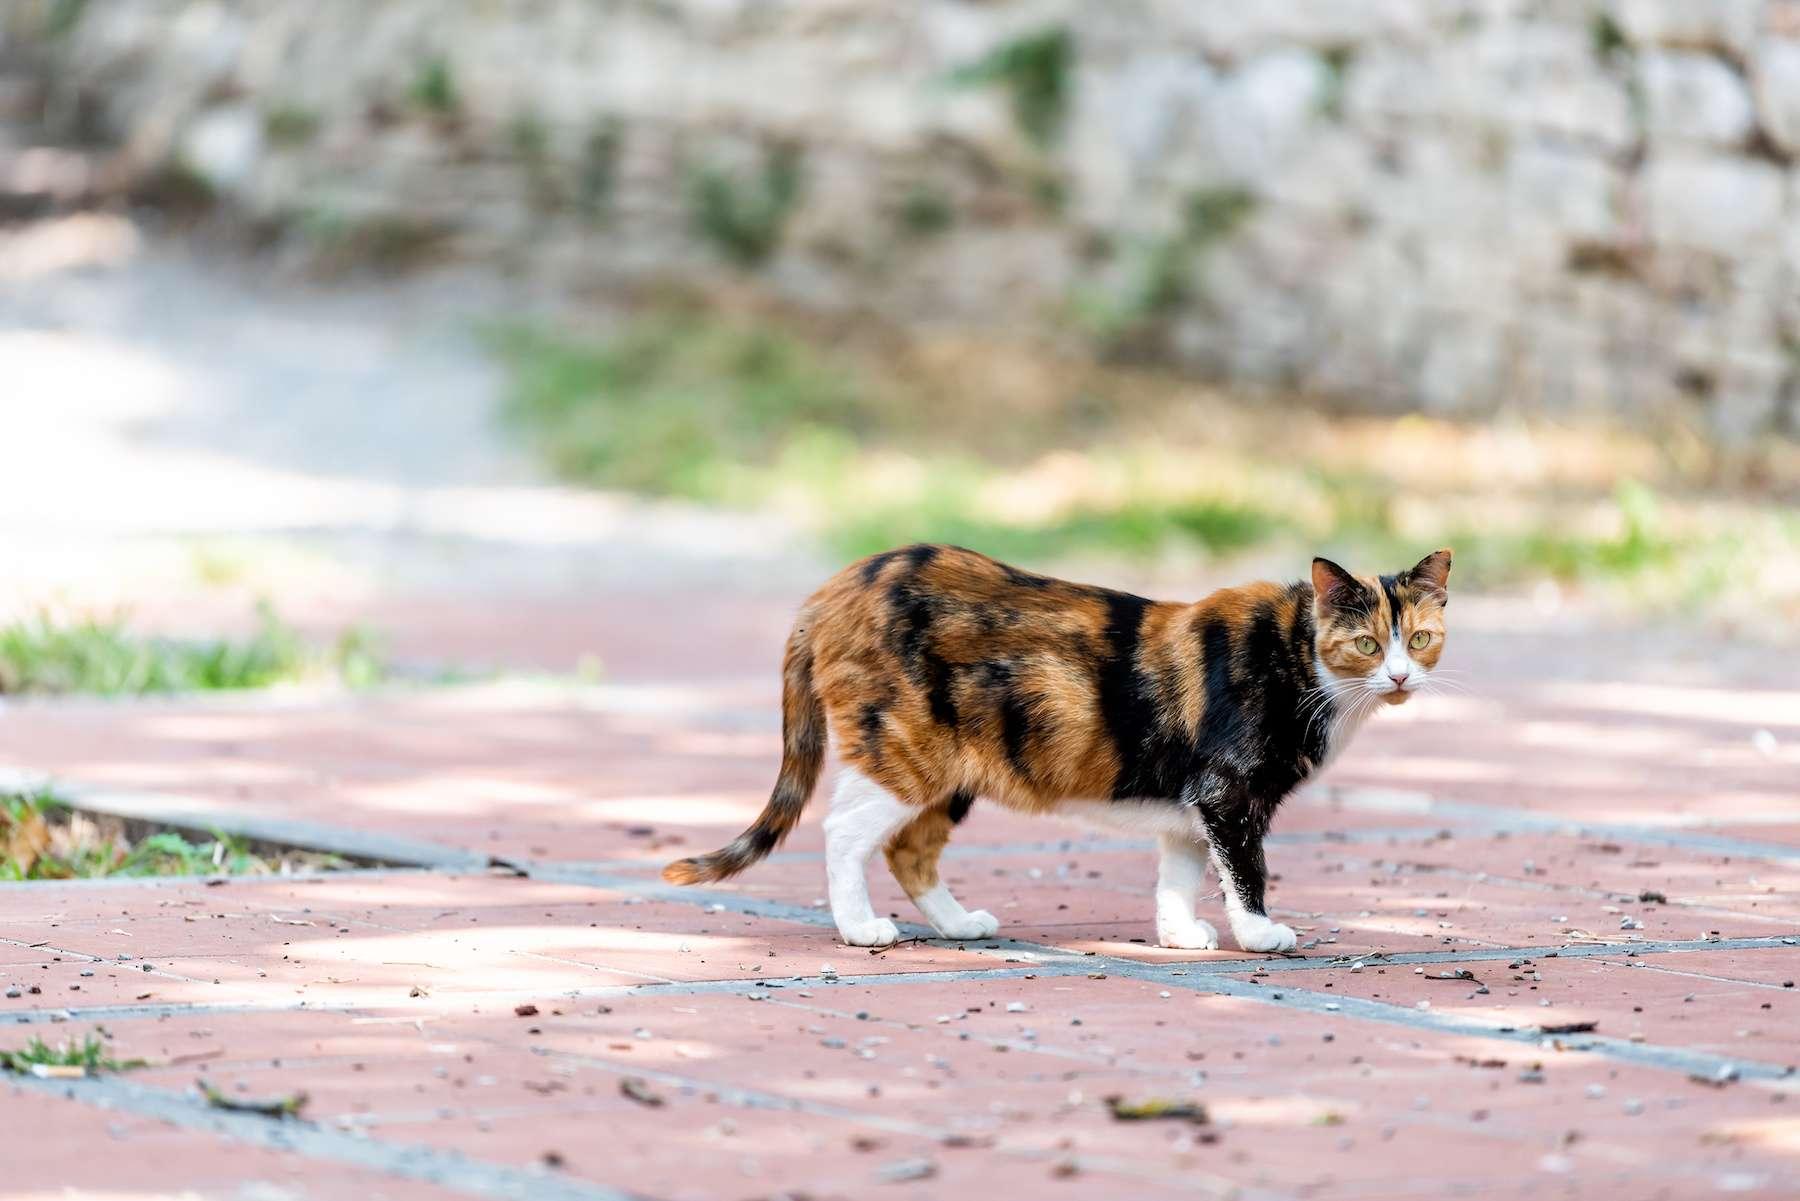 Un chat a contracté un virus rarissime proche de la rage en Italie. © Kristina Blokhin, Adobe Stock